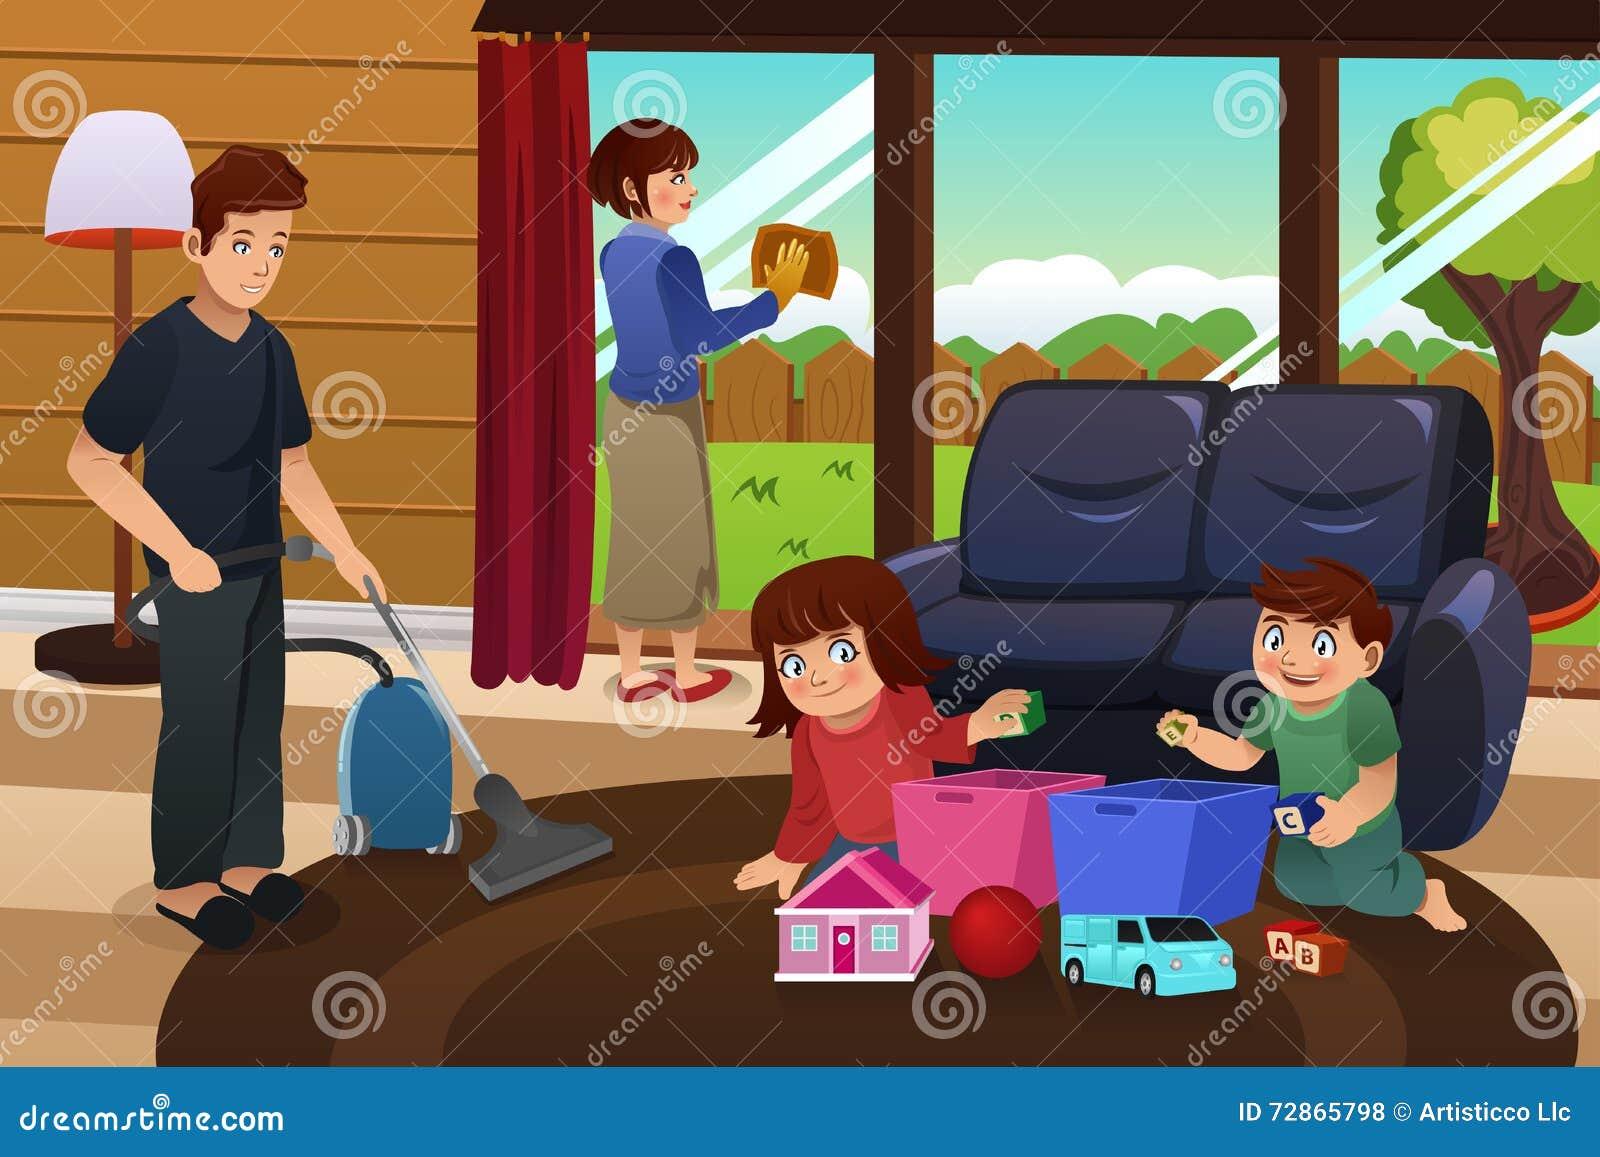 Family cleaning house stock vector illustration of kids - Trabajo limpiando casas ...